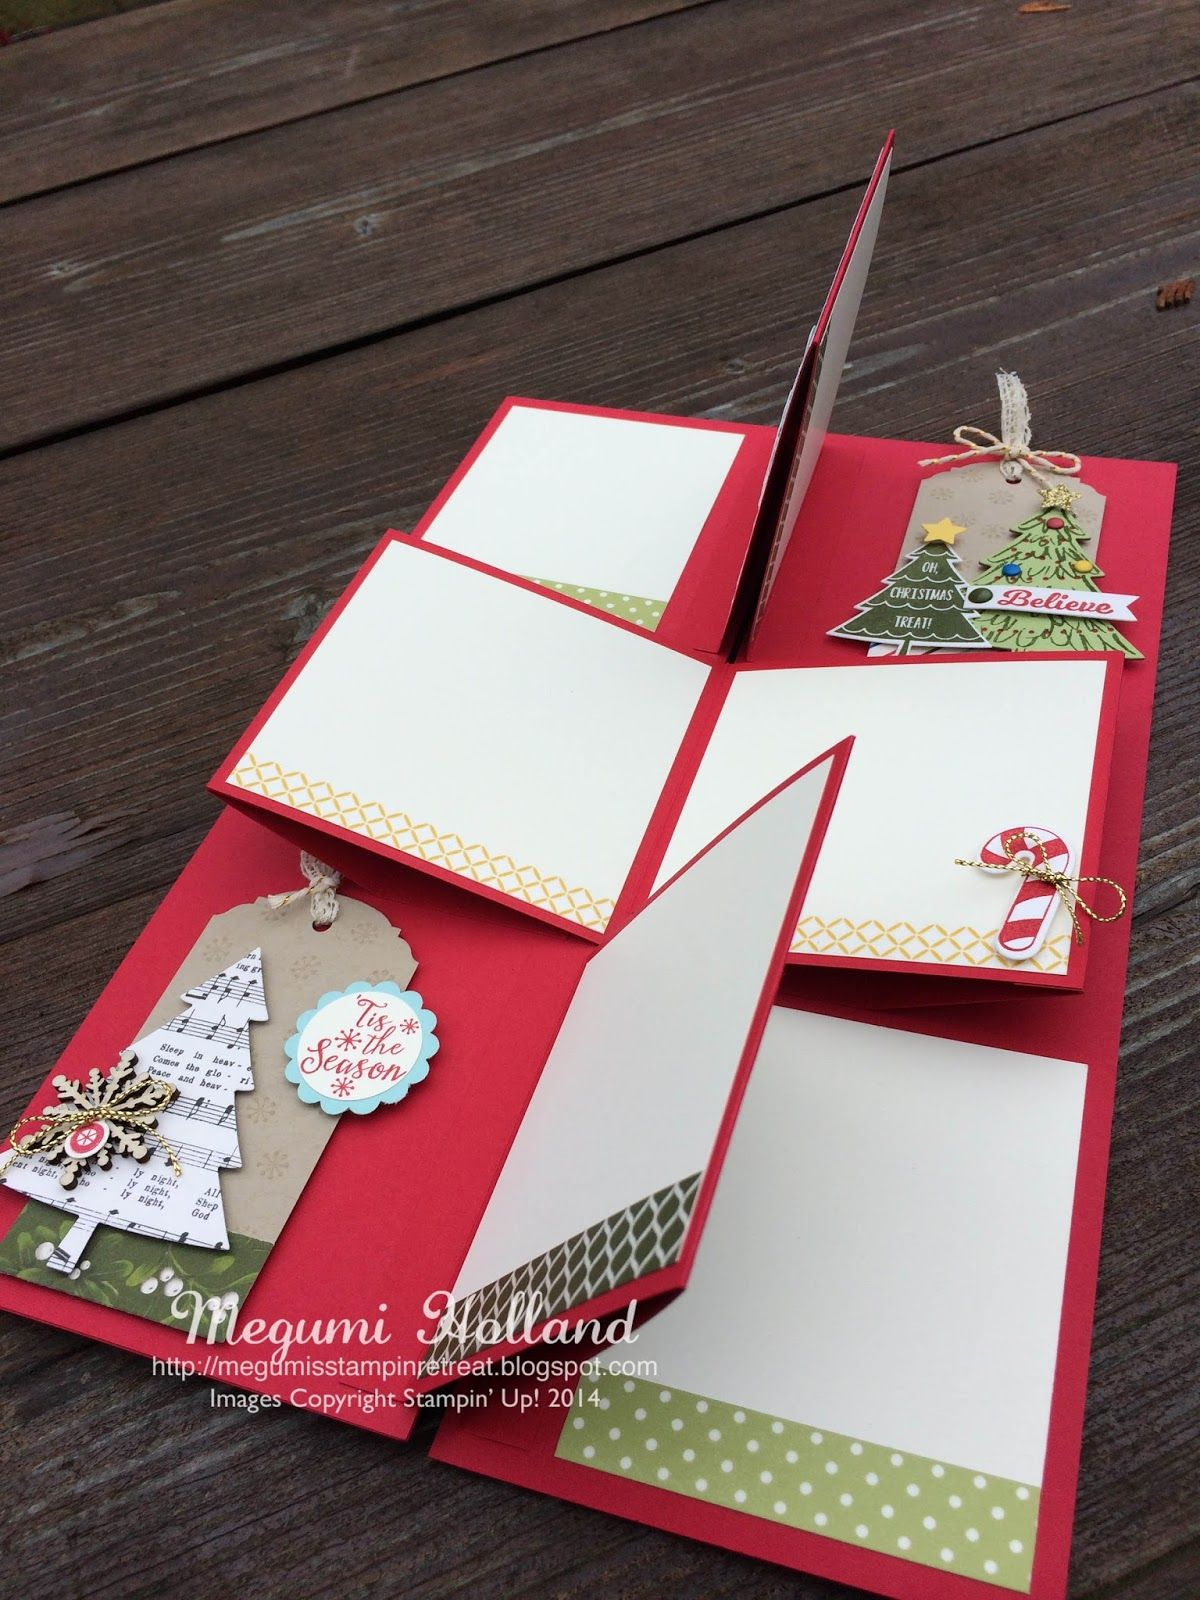 Megumi's Stampin Retreat: Christmas Shutter Scrapbook